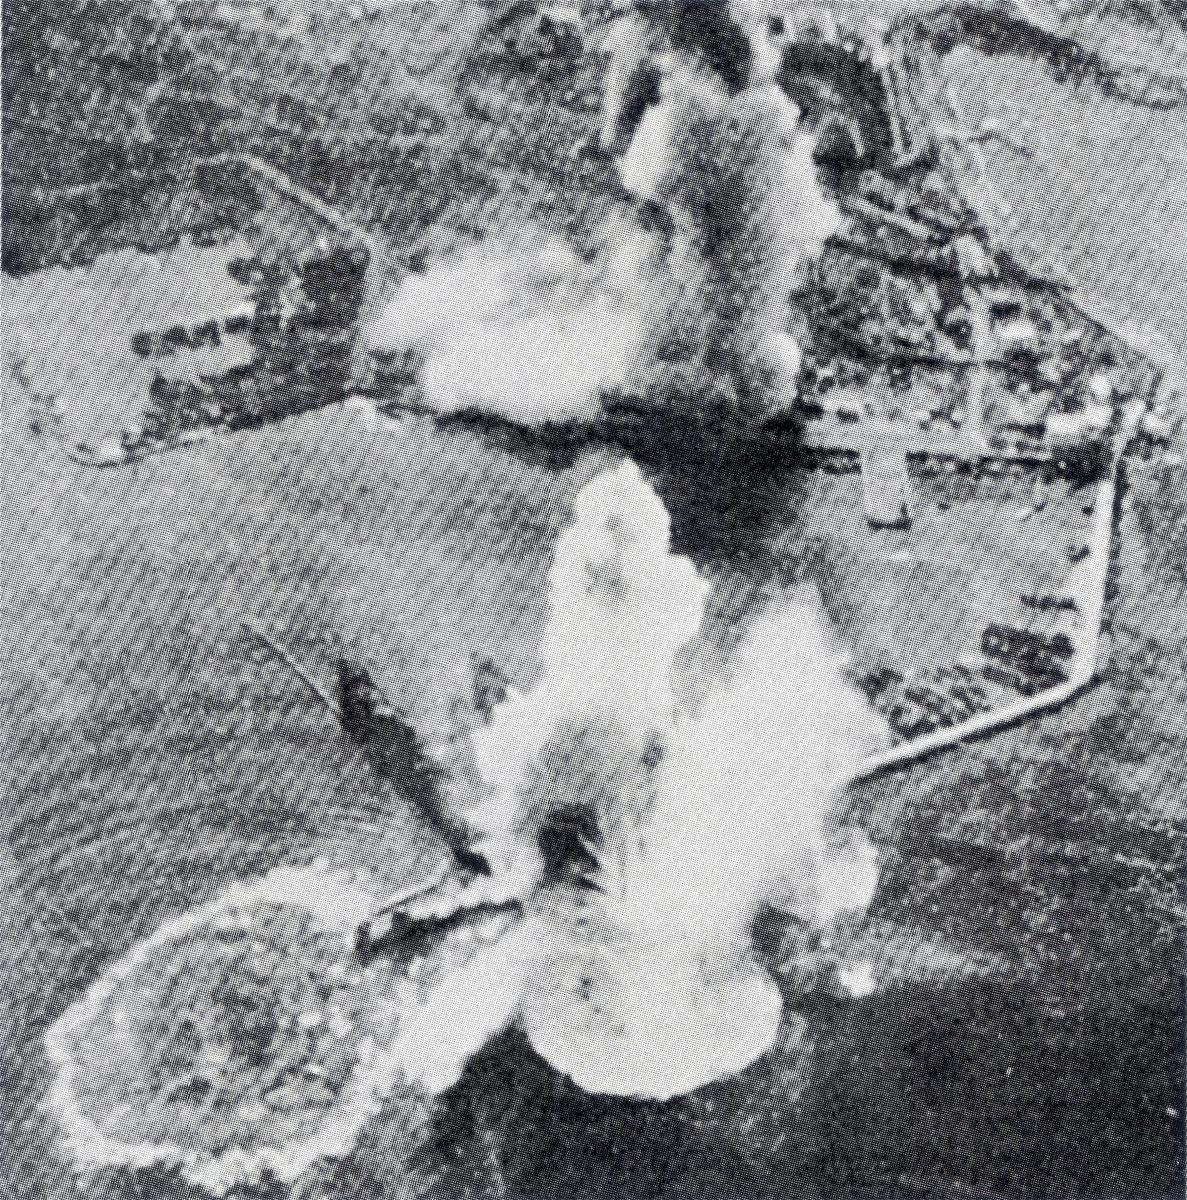 KG307 raid on Piraeus Harbour taken during the raid by Hptm Hajo Herrmann April 6 7 1941 01